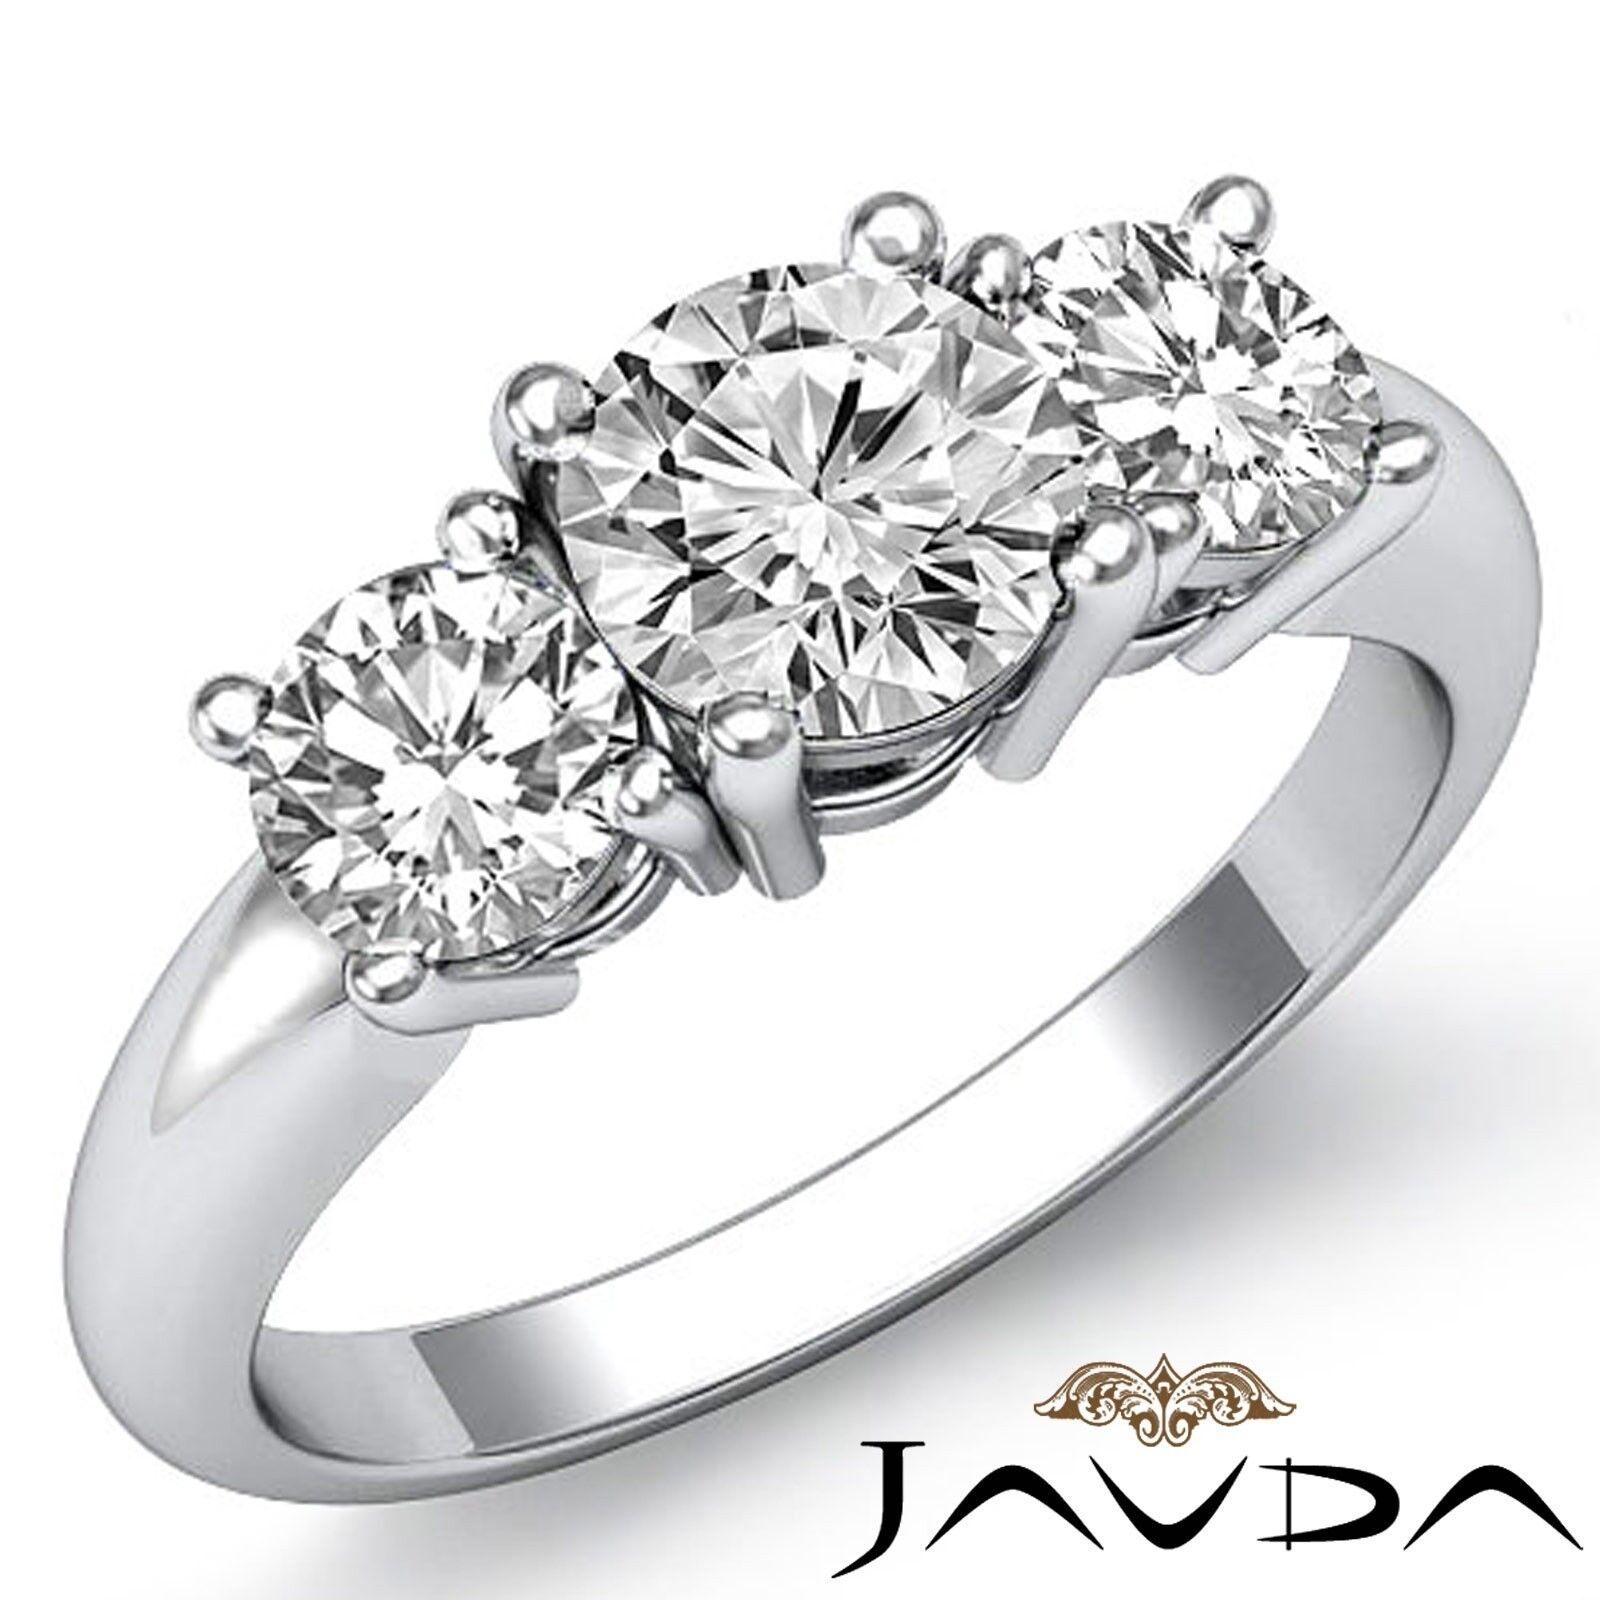 1.54ct Classic 3Stone Basket Round Diamond Engagement Ring GIA I-VVS1 White Gold